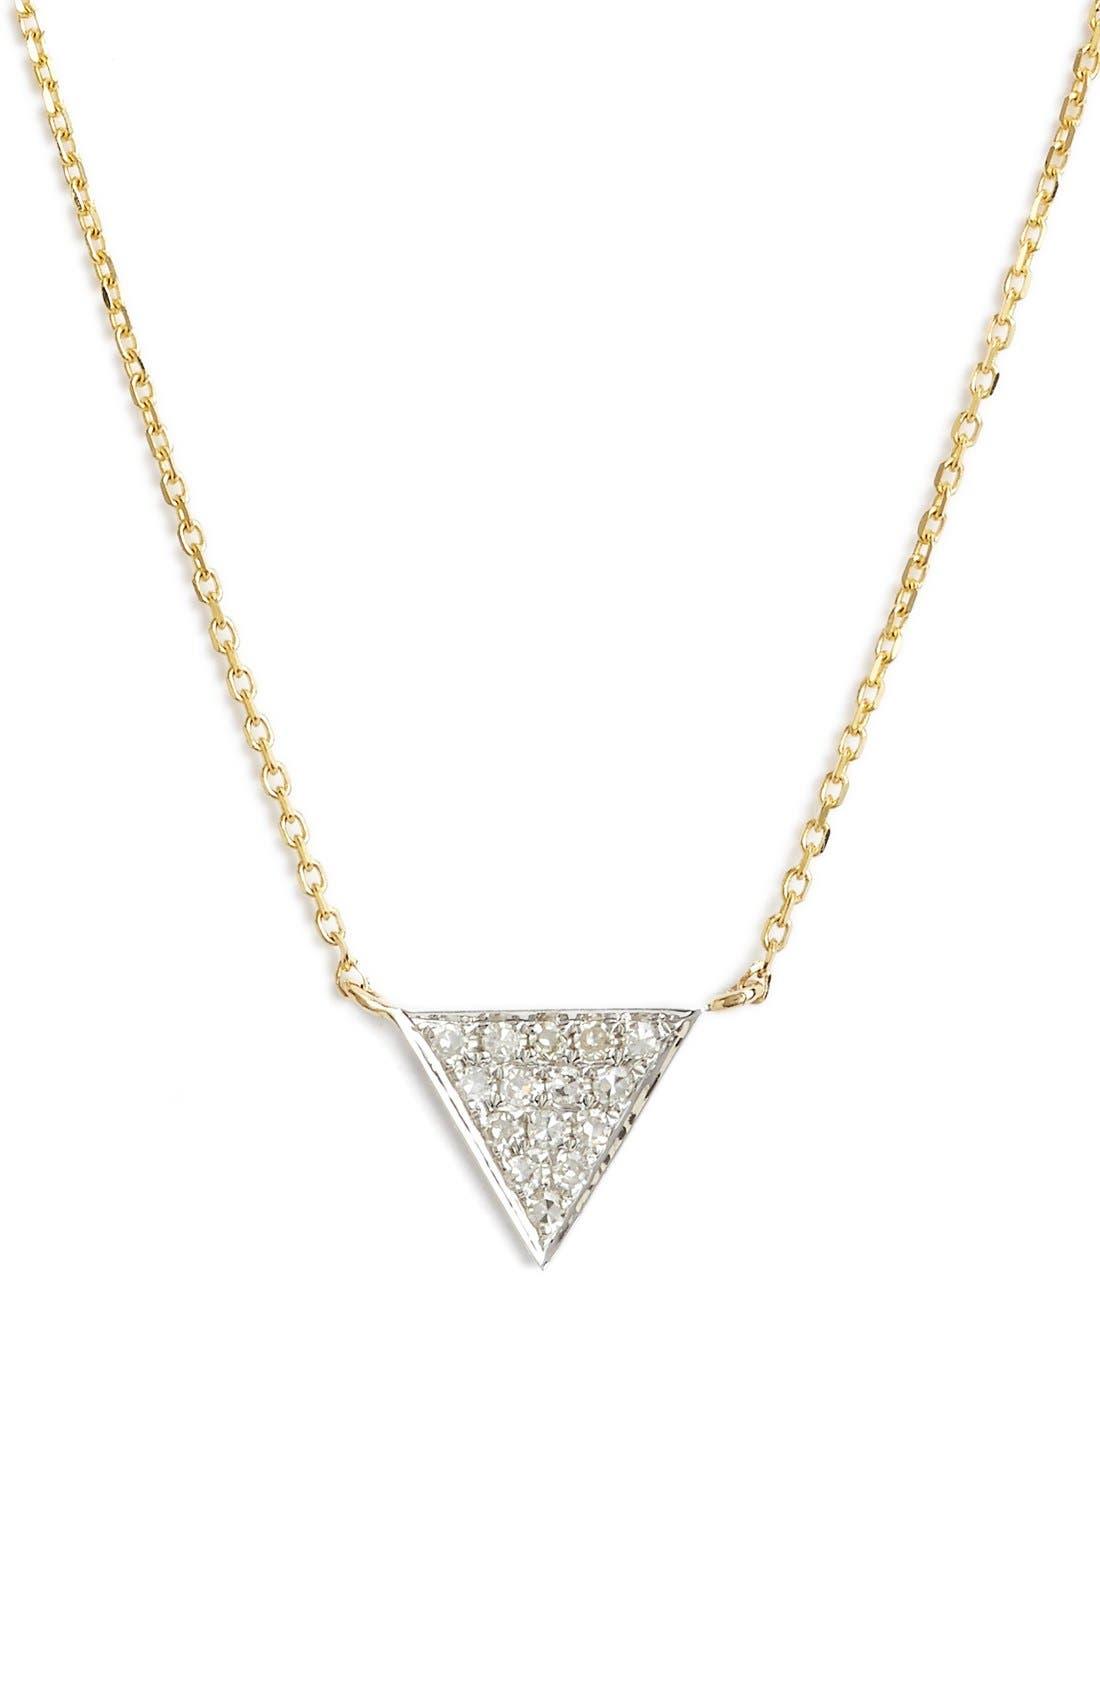 Beautiful pyramid triangle design Rosecut pave diamond pendant 925 sterling silver handmade finish diamond jewelry pendant necklace